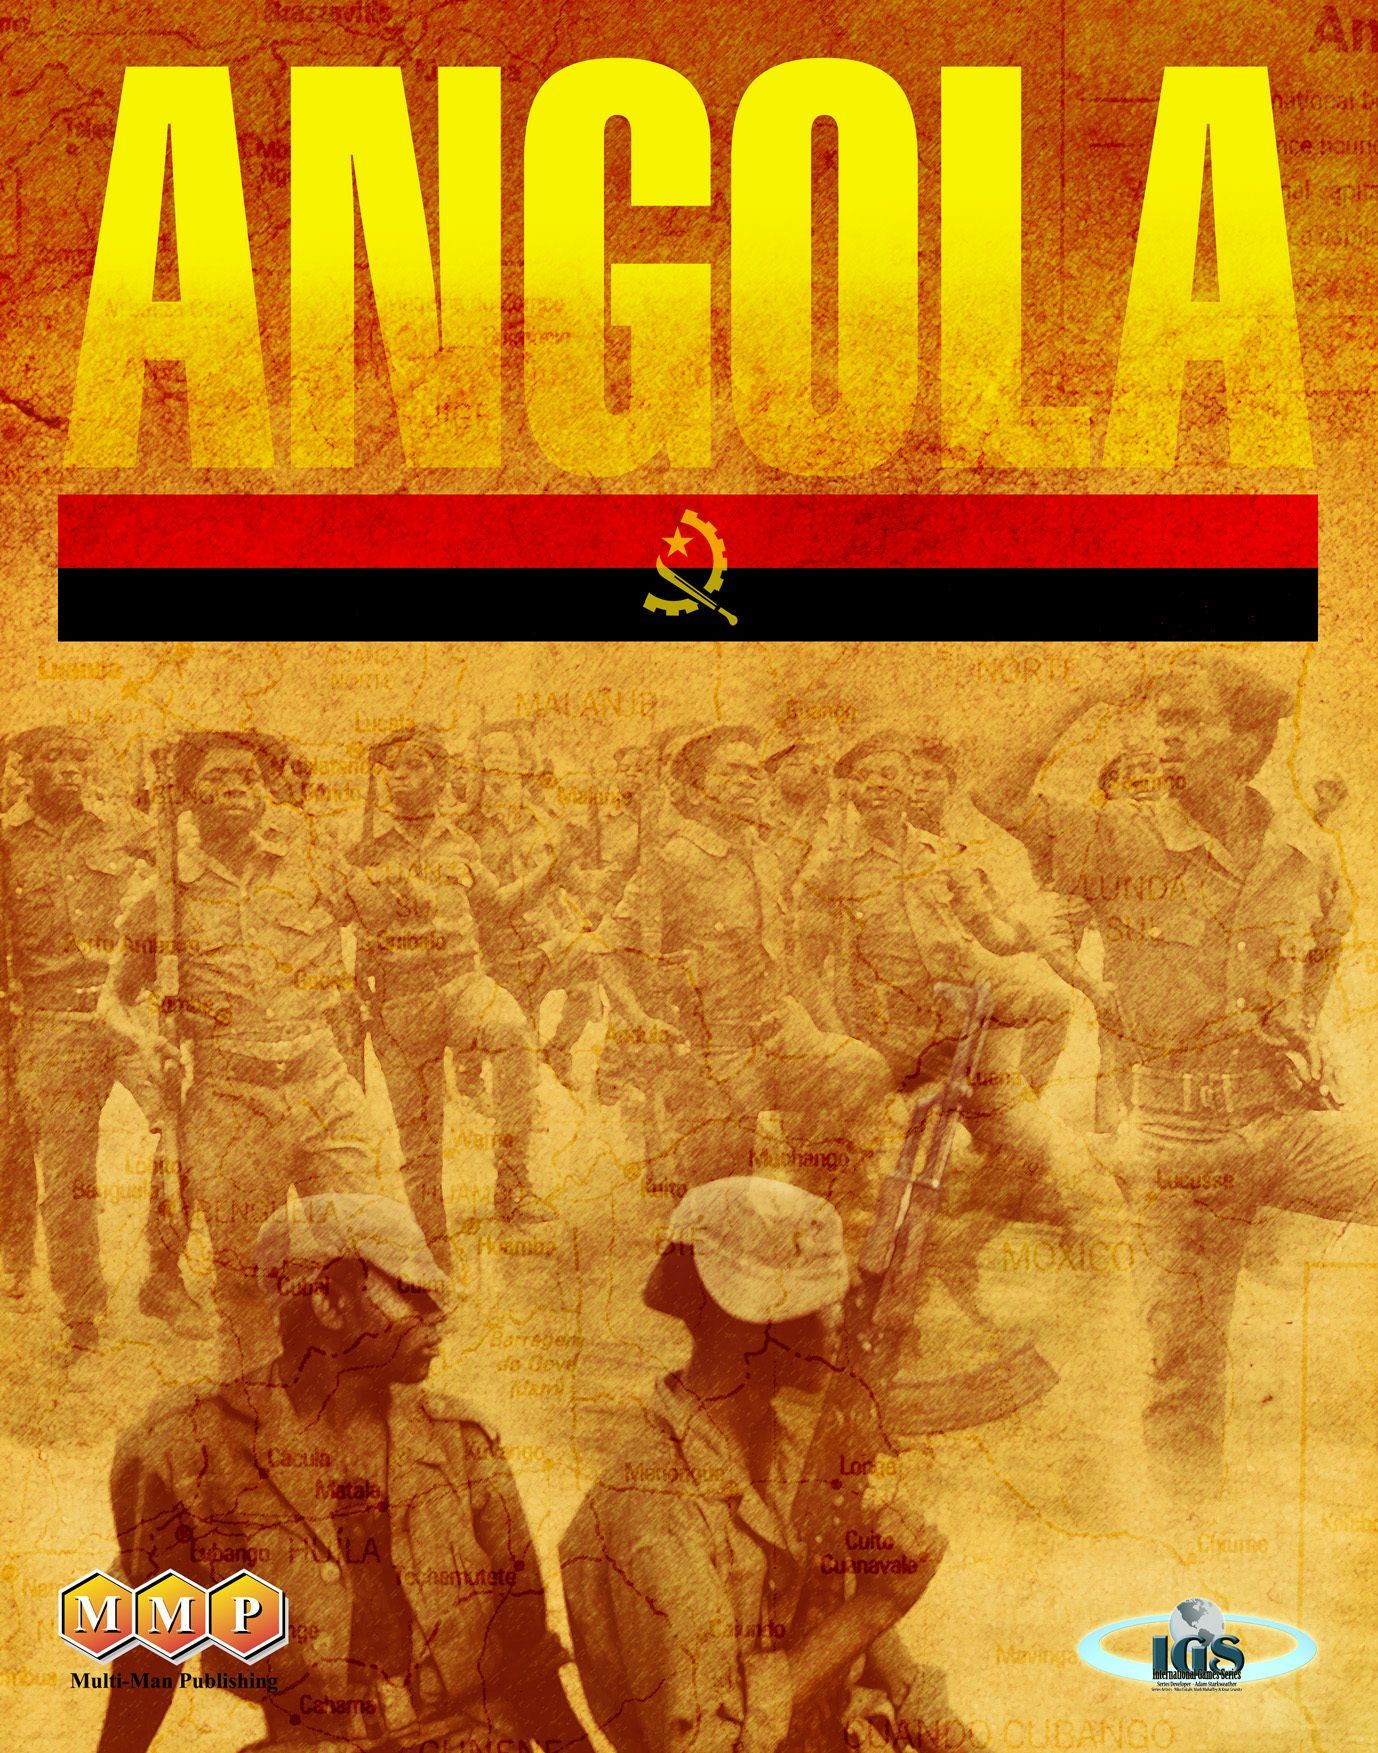 Main image for Angola